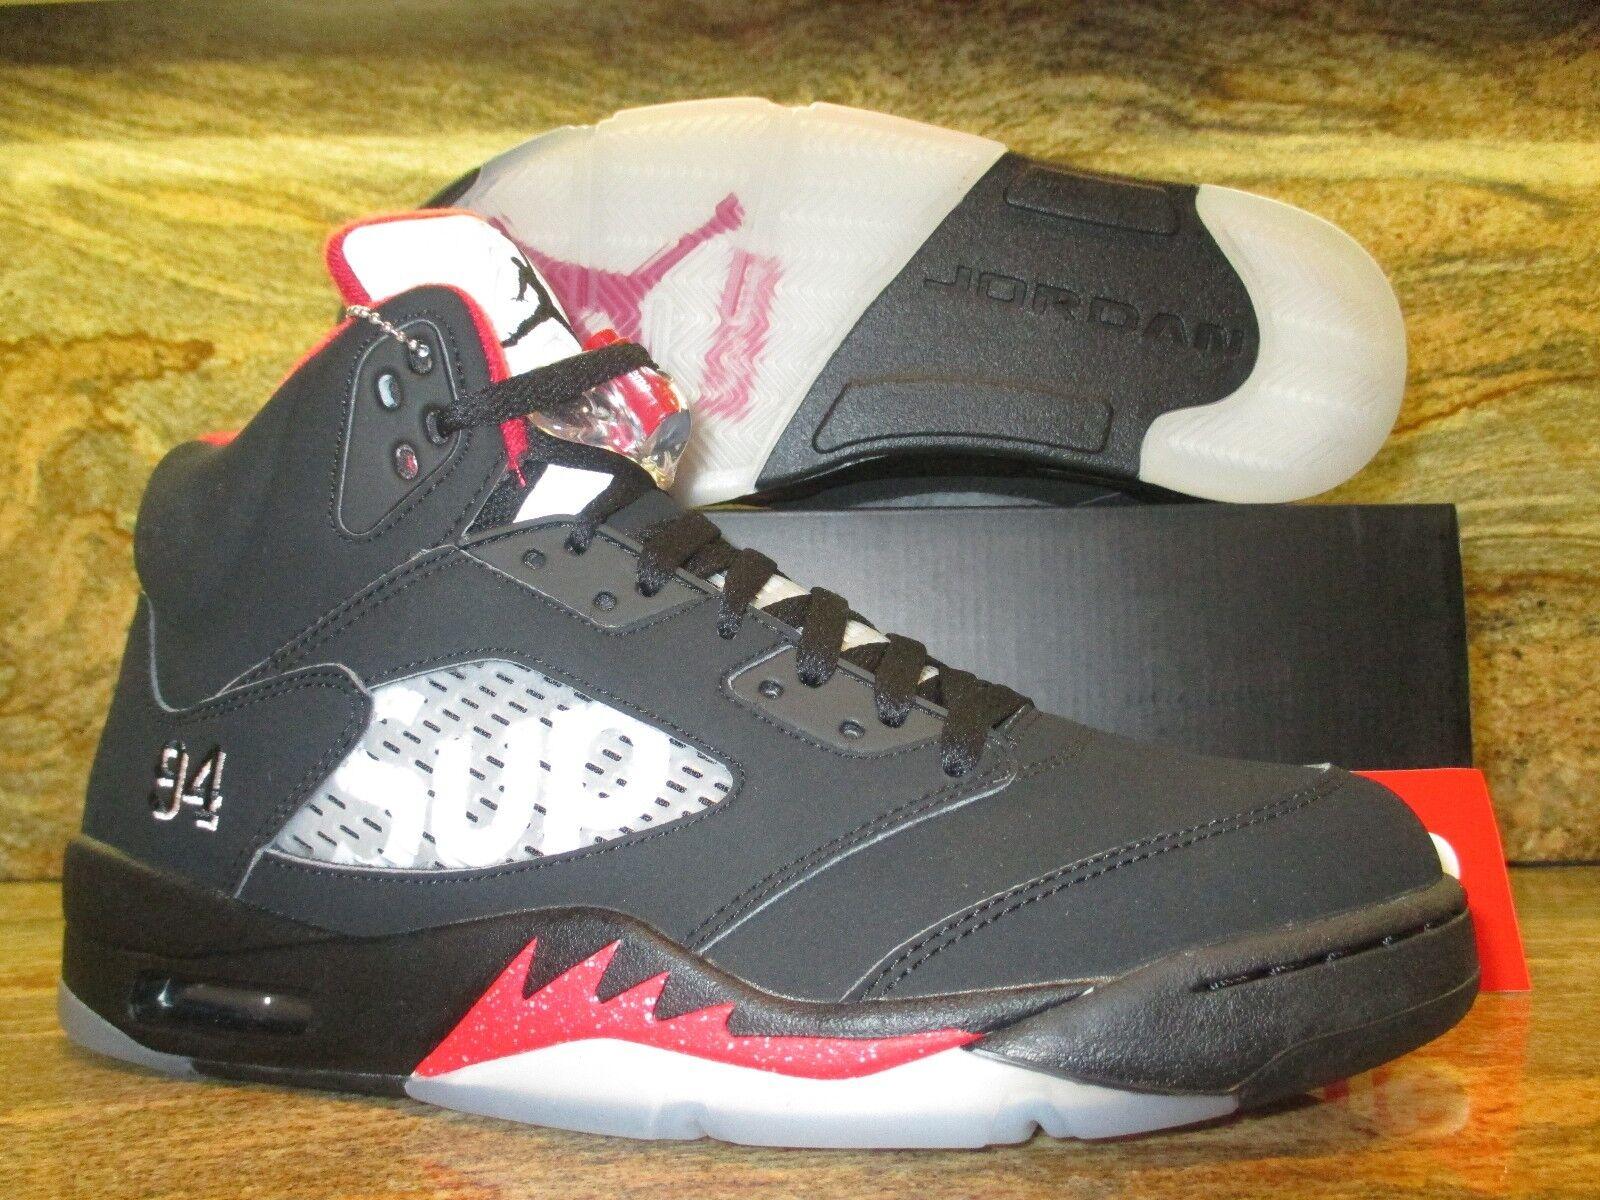 Nike Air Jordan 5 V Retro SUPREME SZ 14 Black Varsity Red BRED Bulls 824371-001